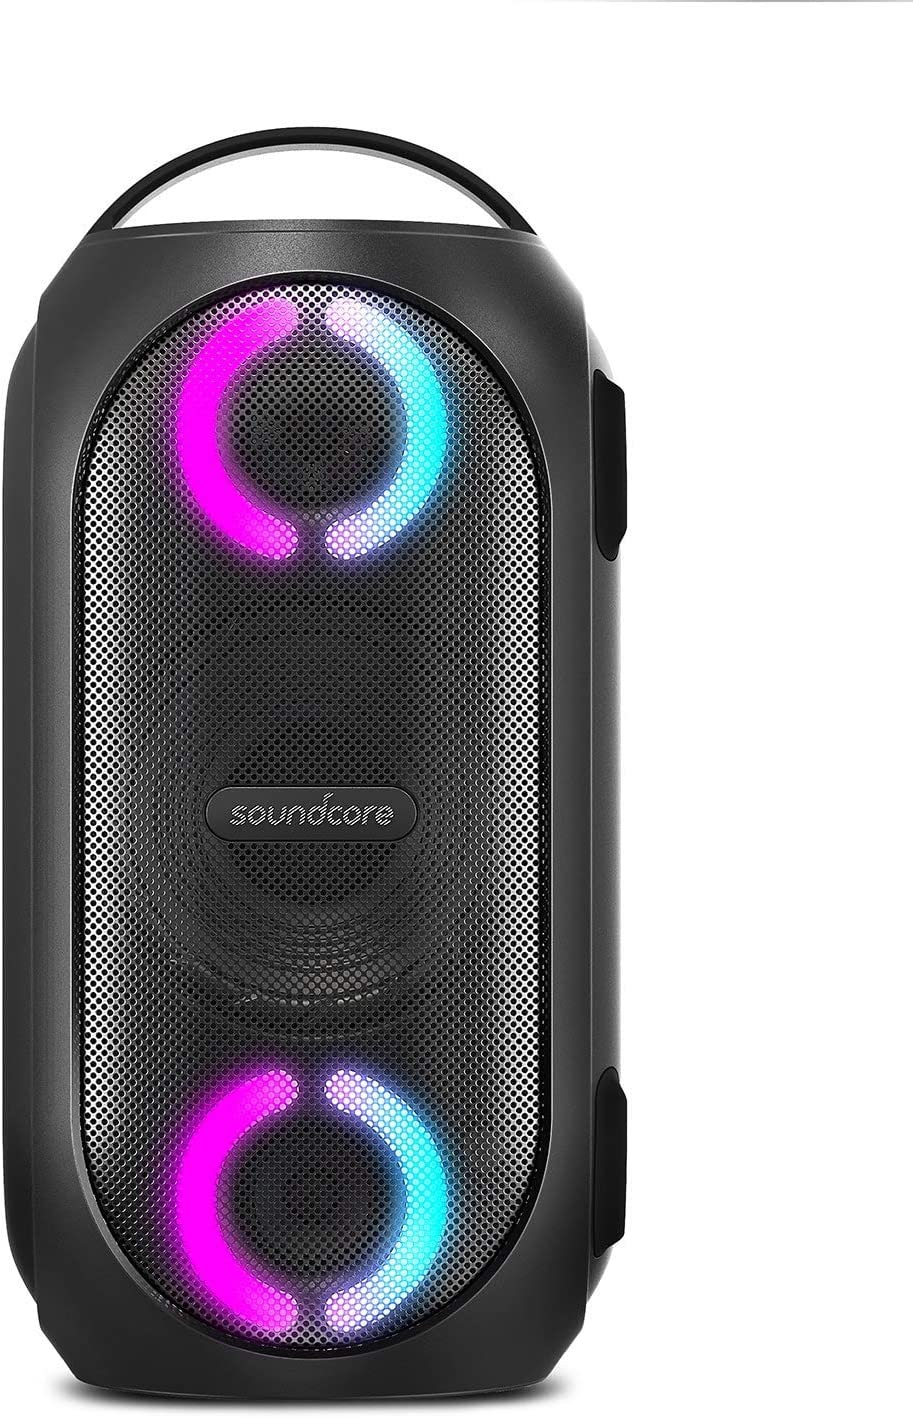 Anker Soundcore Rave Mini Portable Party Speaker, Huge 101dB Sound